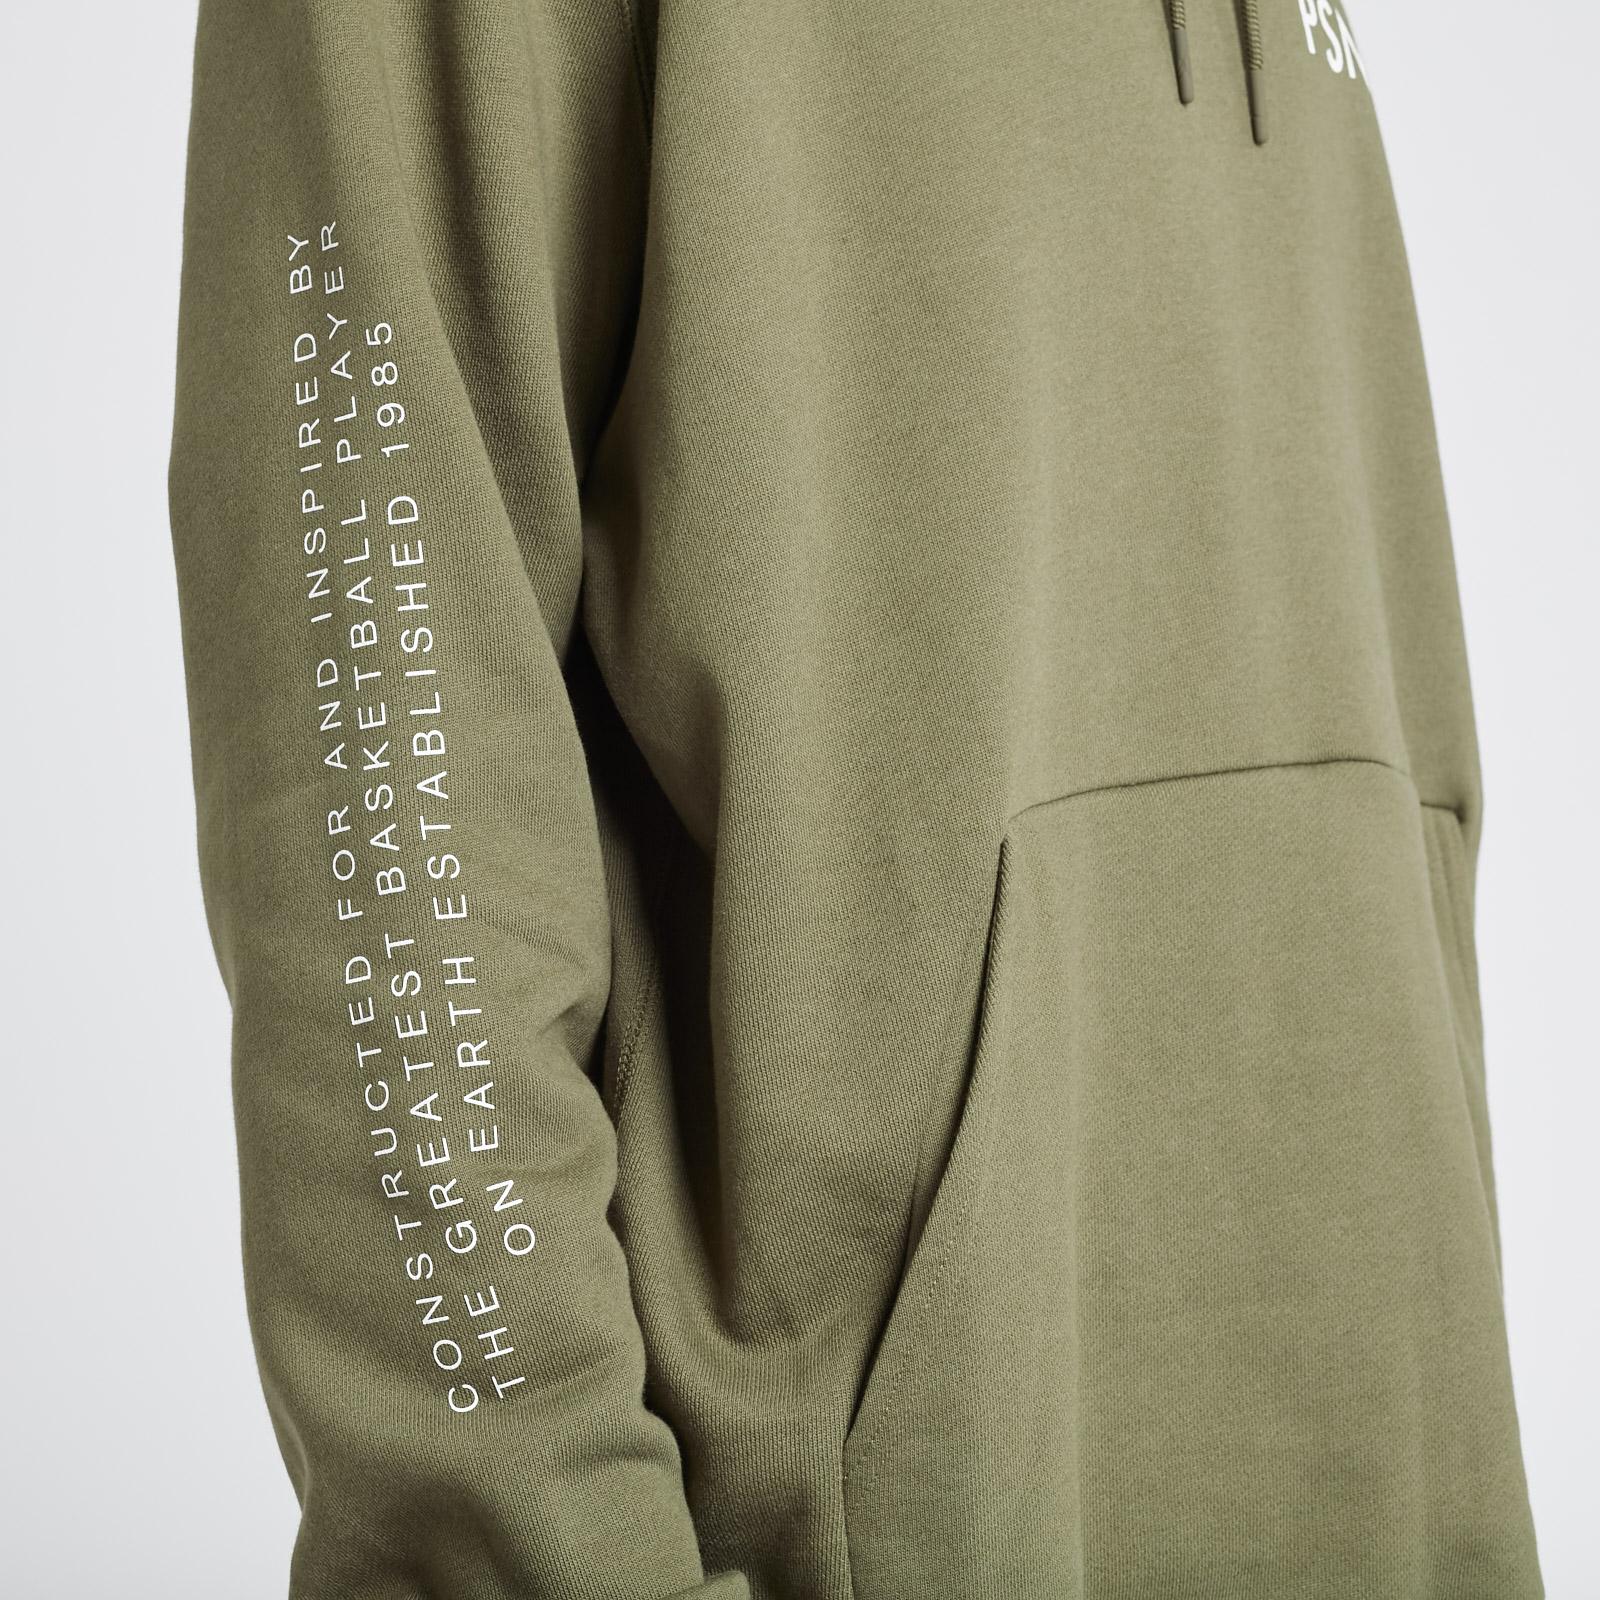 2b0523875bf99e Jordan Brand Pullover Hoodie x PSNY - Aa8889-222 - Sneakersnstuff ...